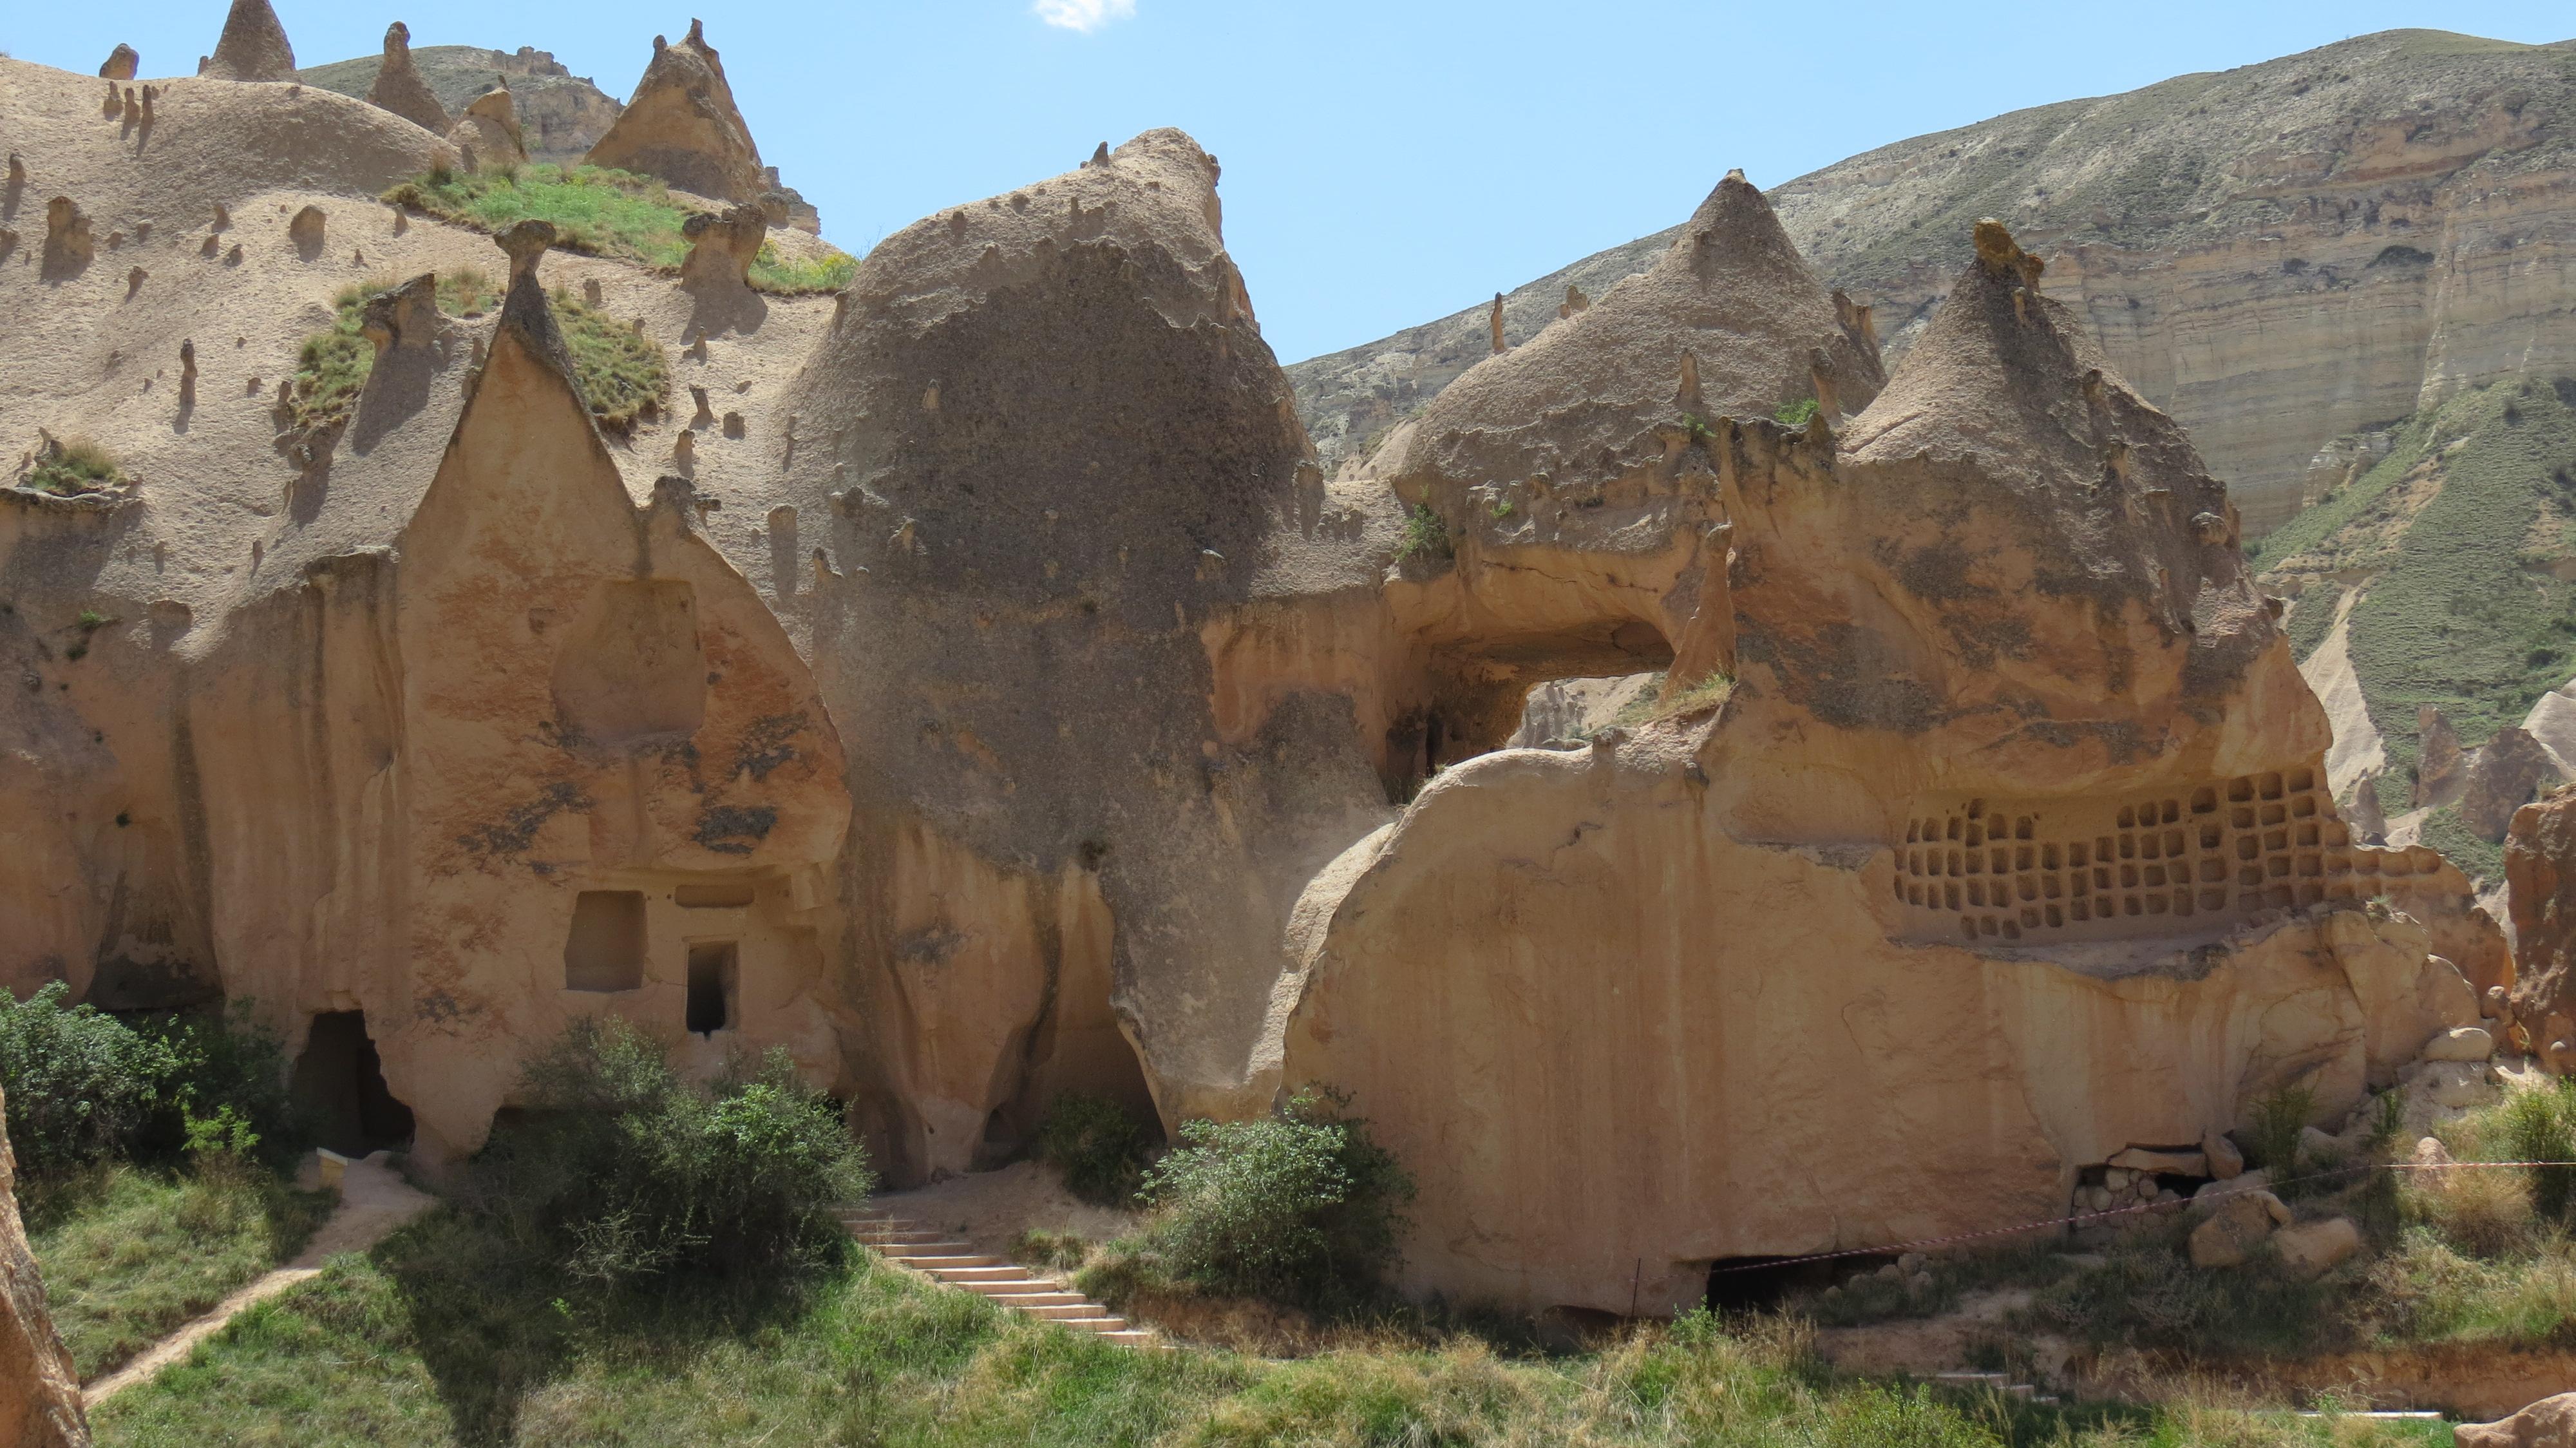 Luca Errera, Daniela Trastulli, Turchia, Cappadocia